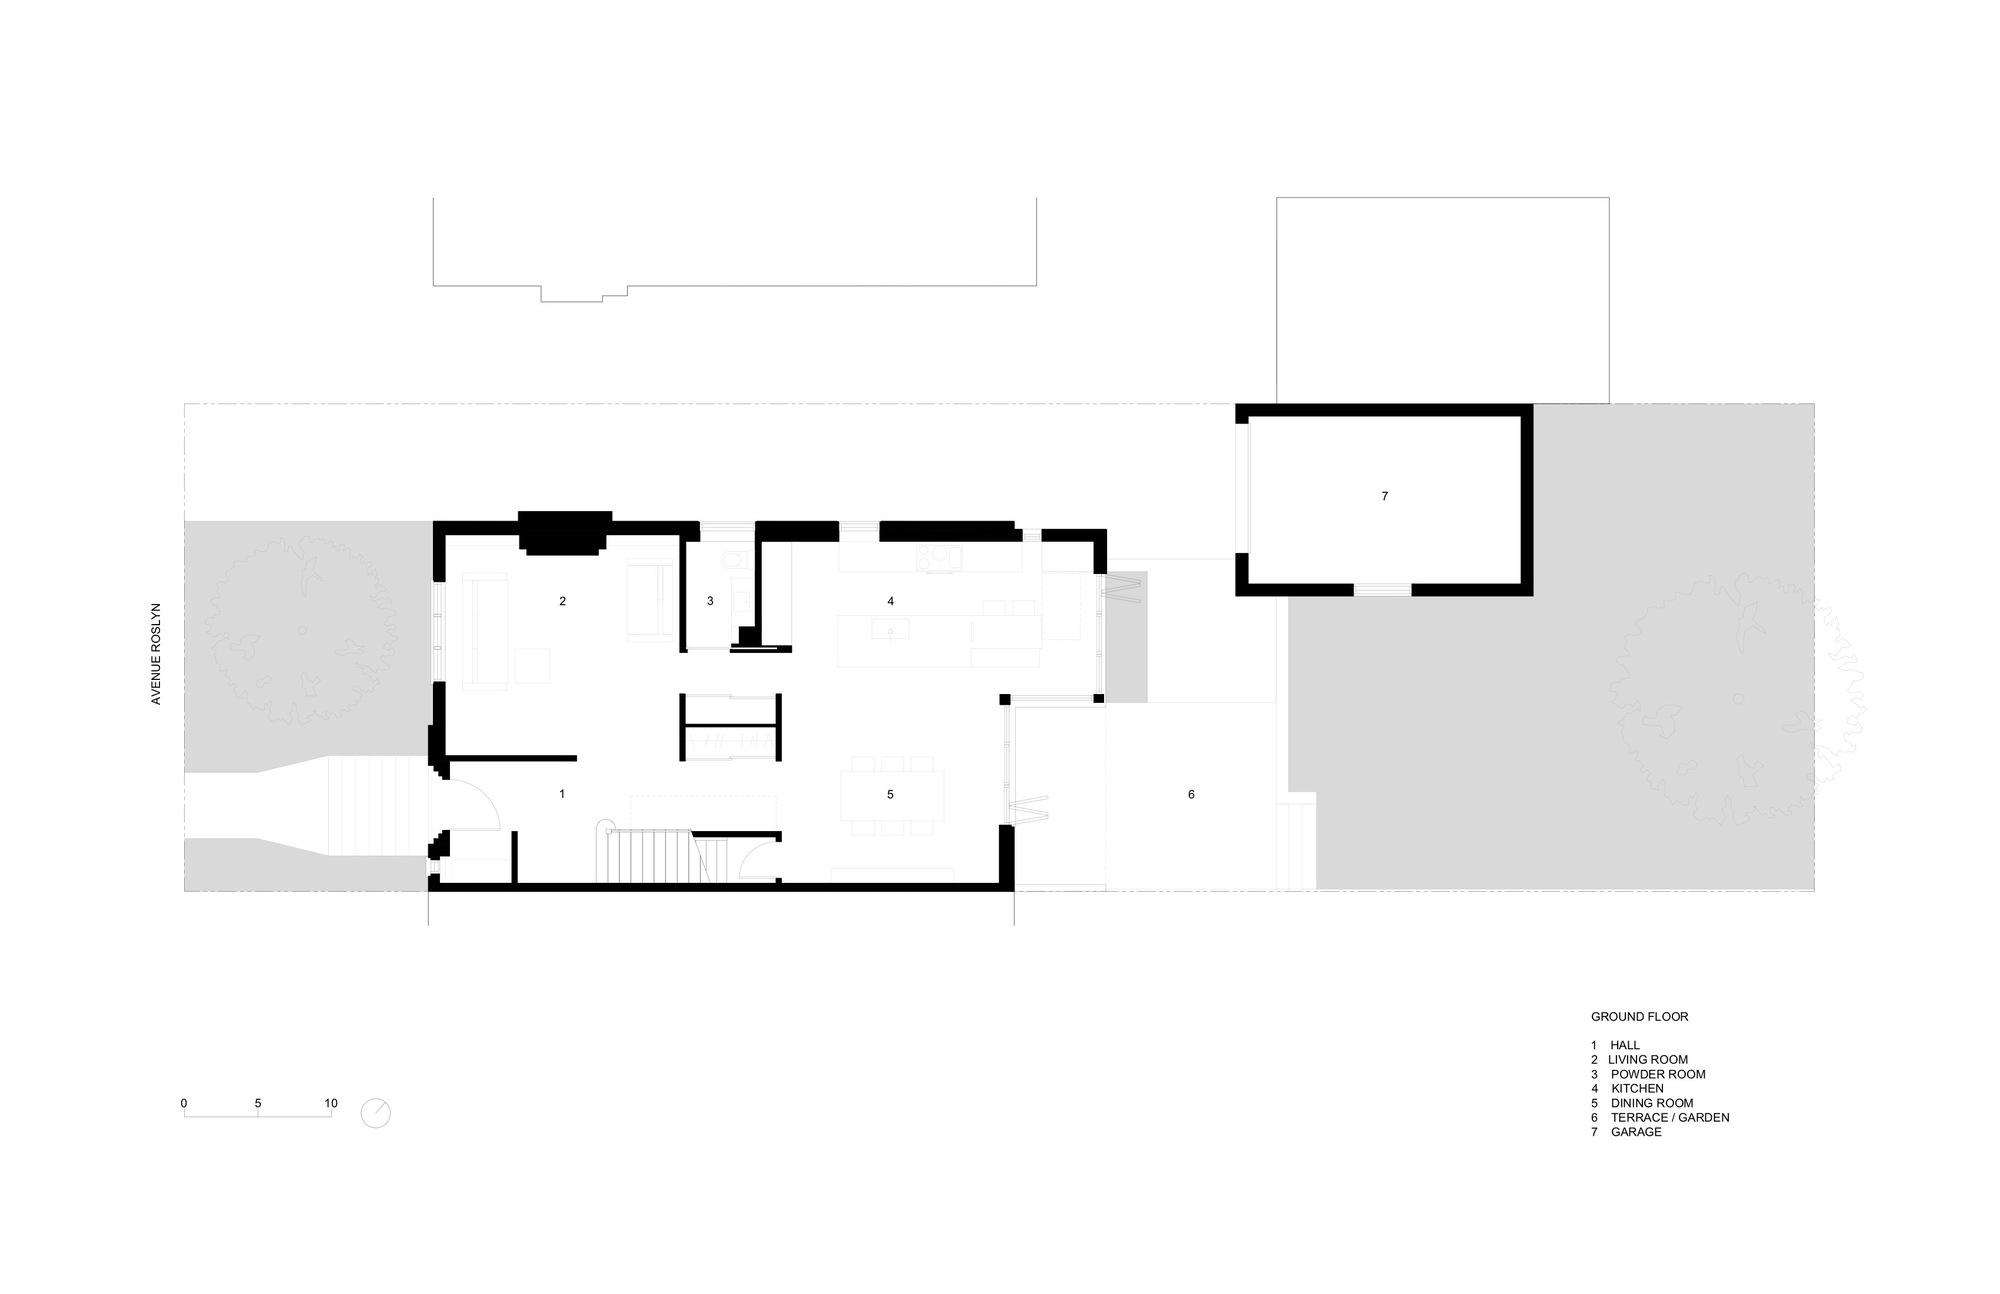 Black Box Ii Natalie Dionne Architecture Archdaily Diagram Ground Floor Plan